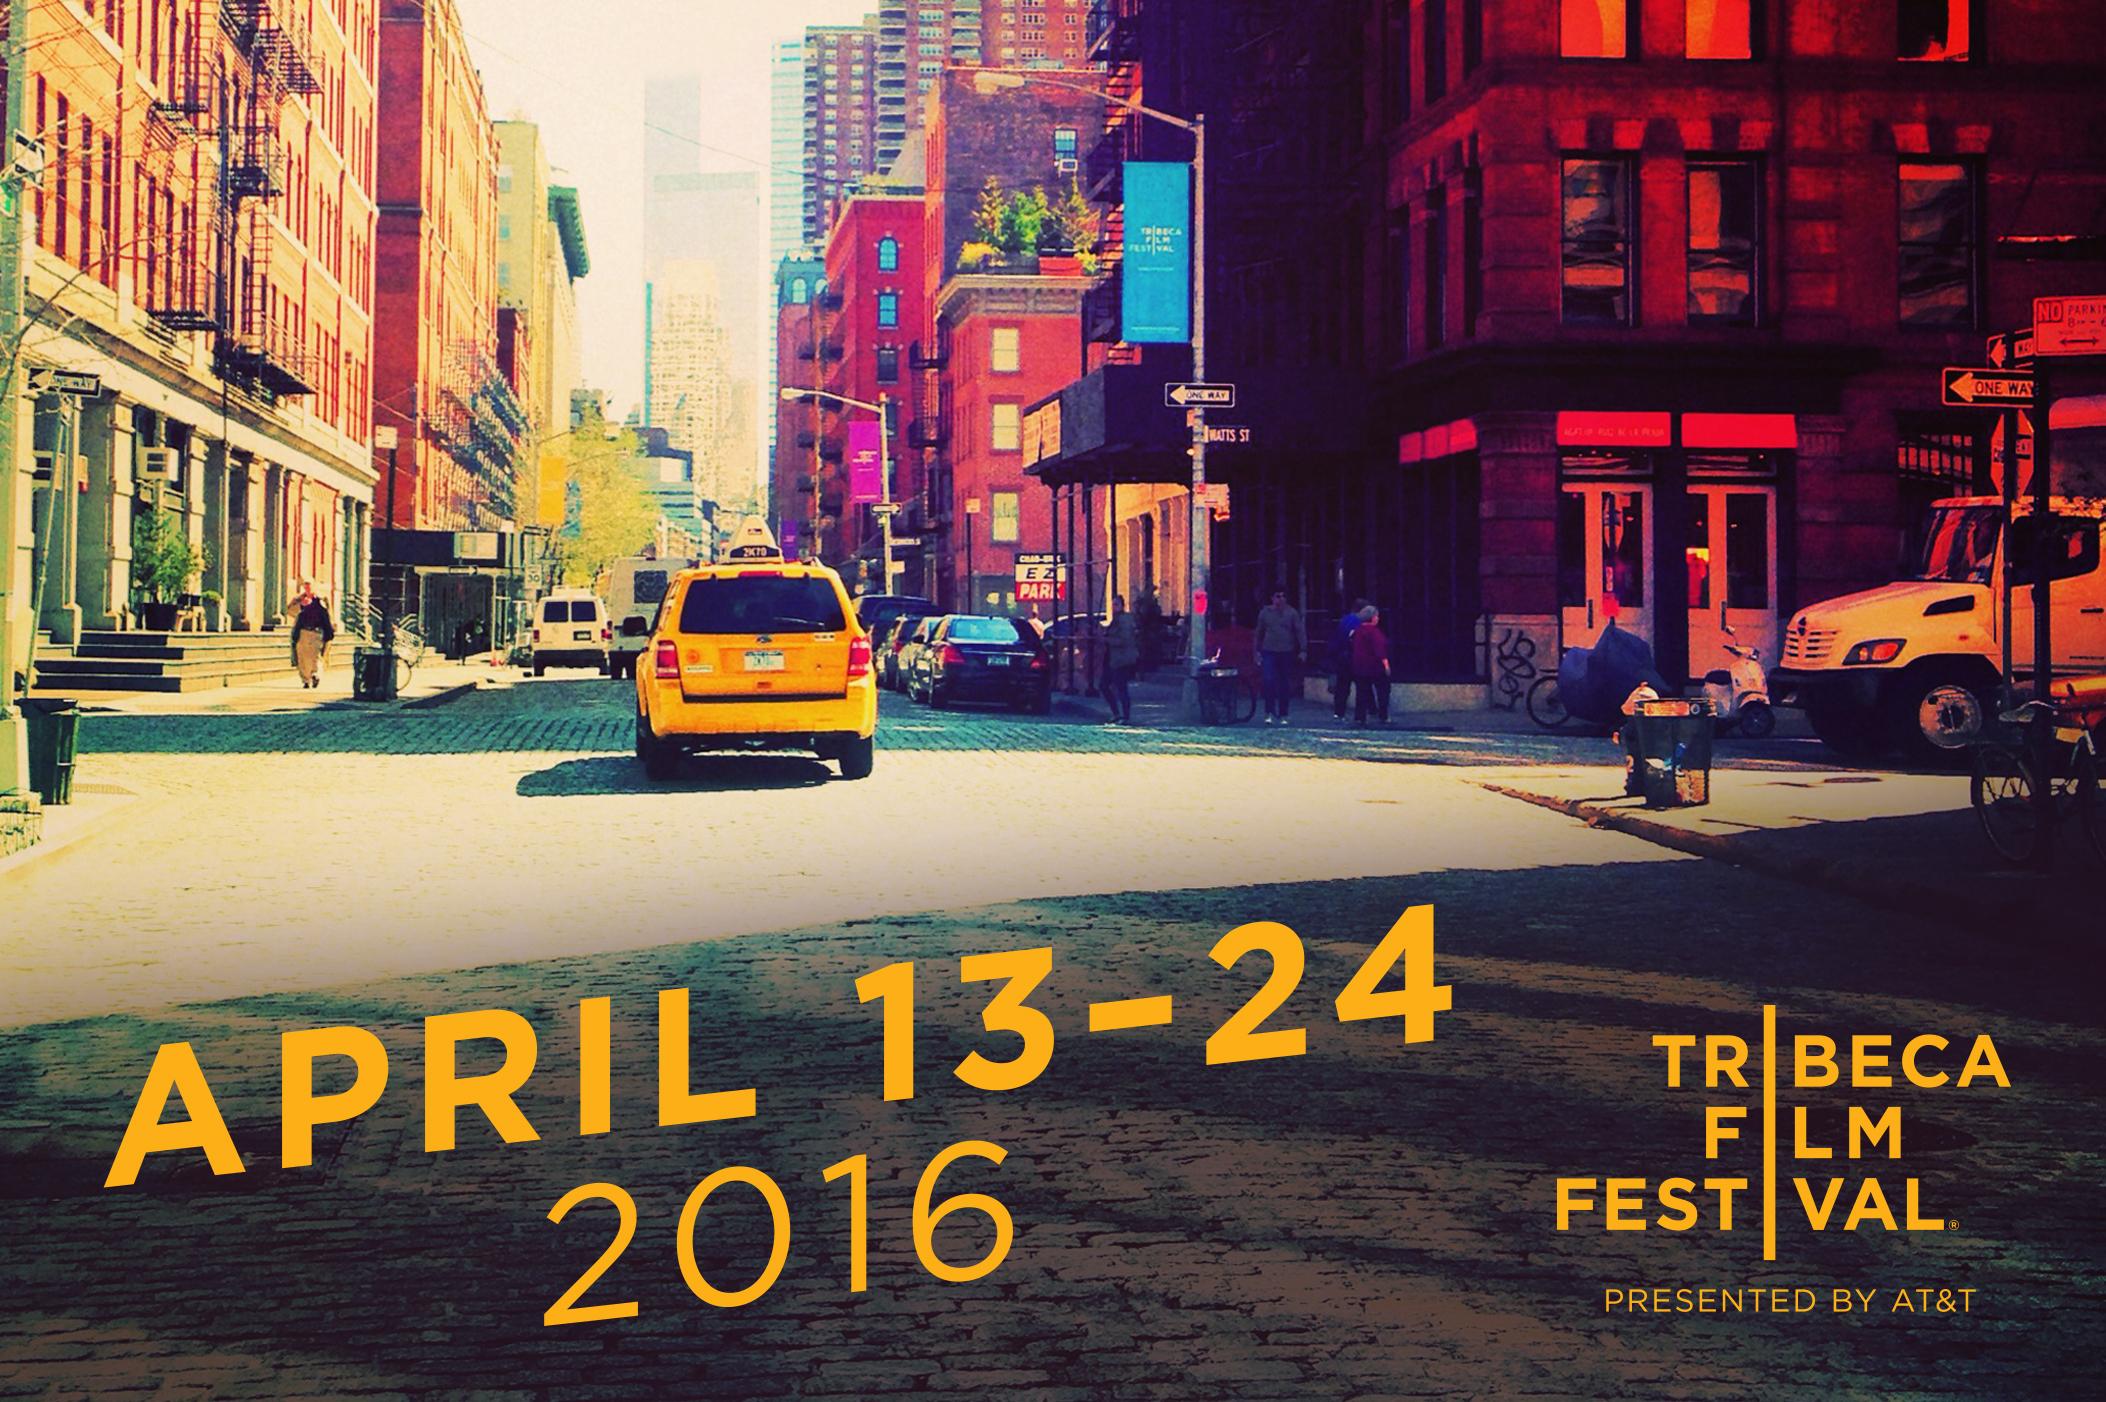 The 15th Tribeca Film Festival